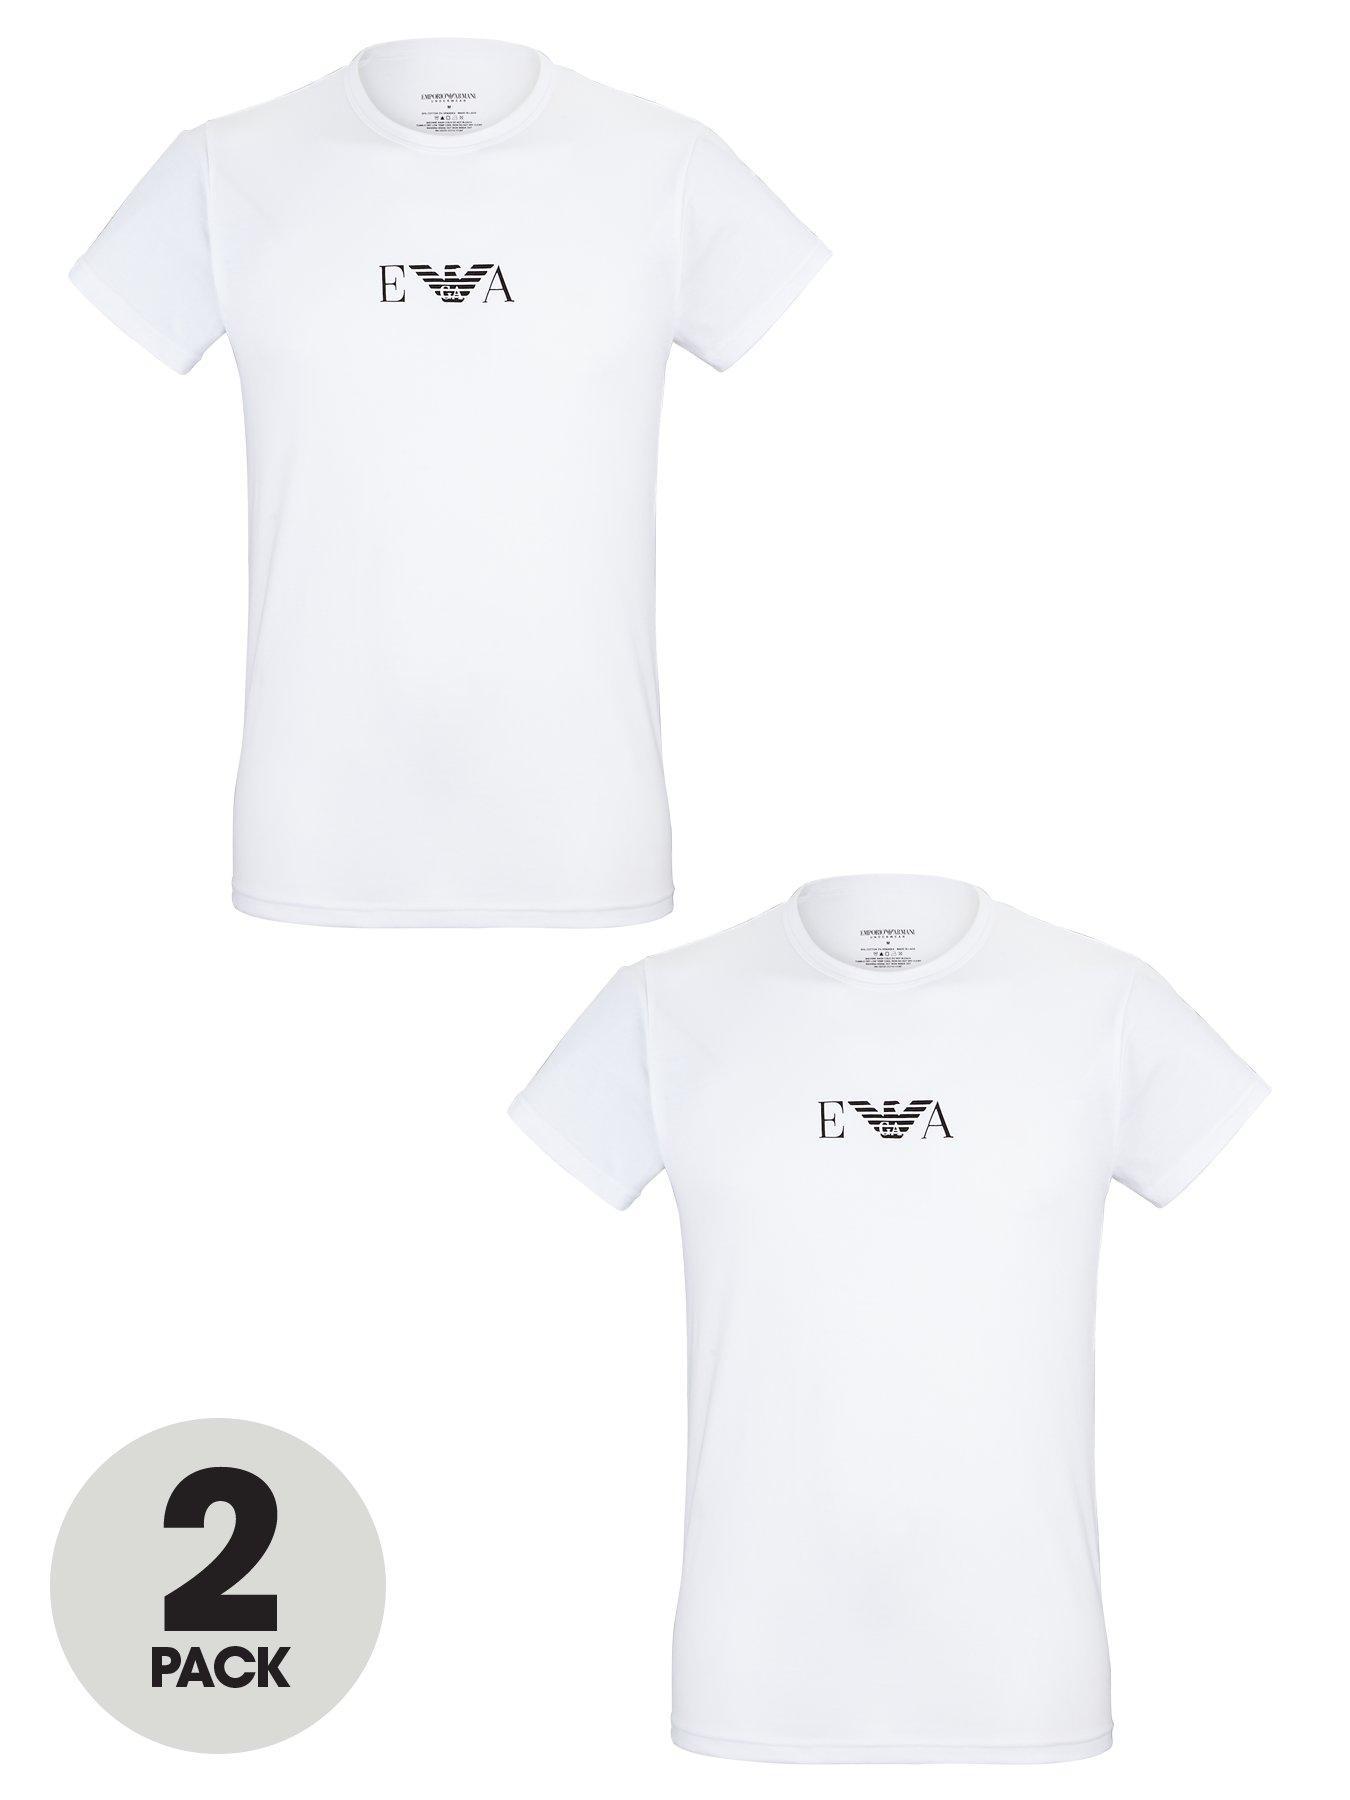 bb2dadc1e58c Brand co uk Very Store Armani Emporio 6vxYY